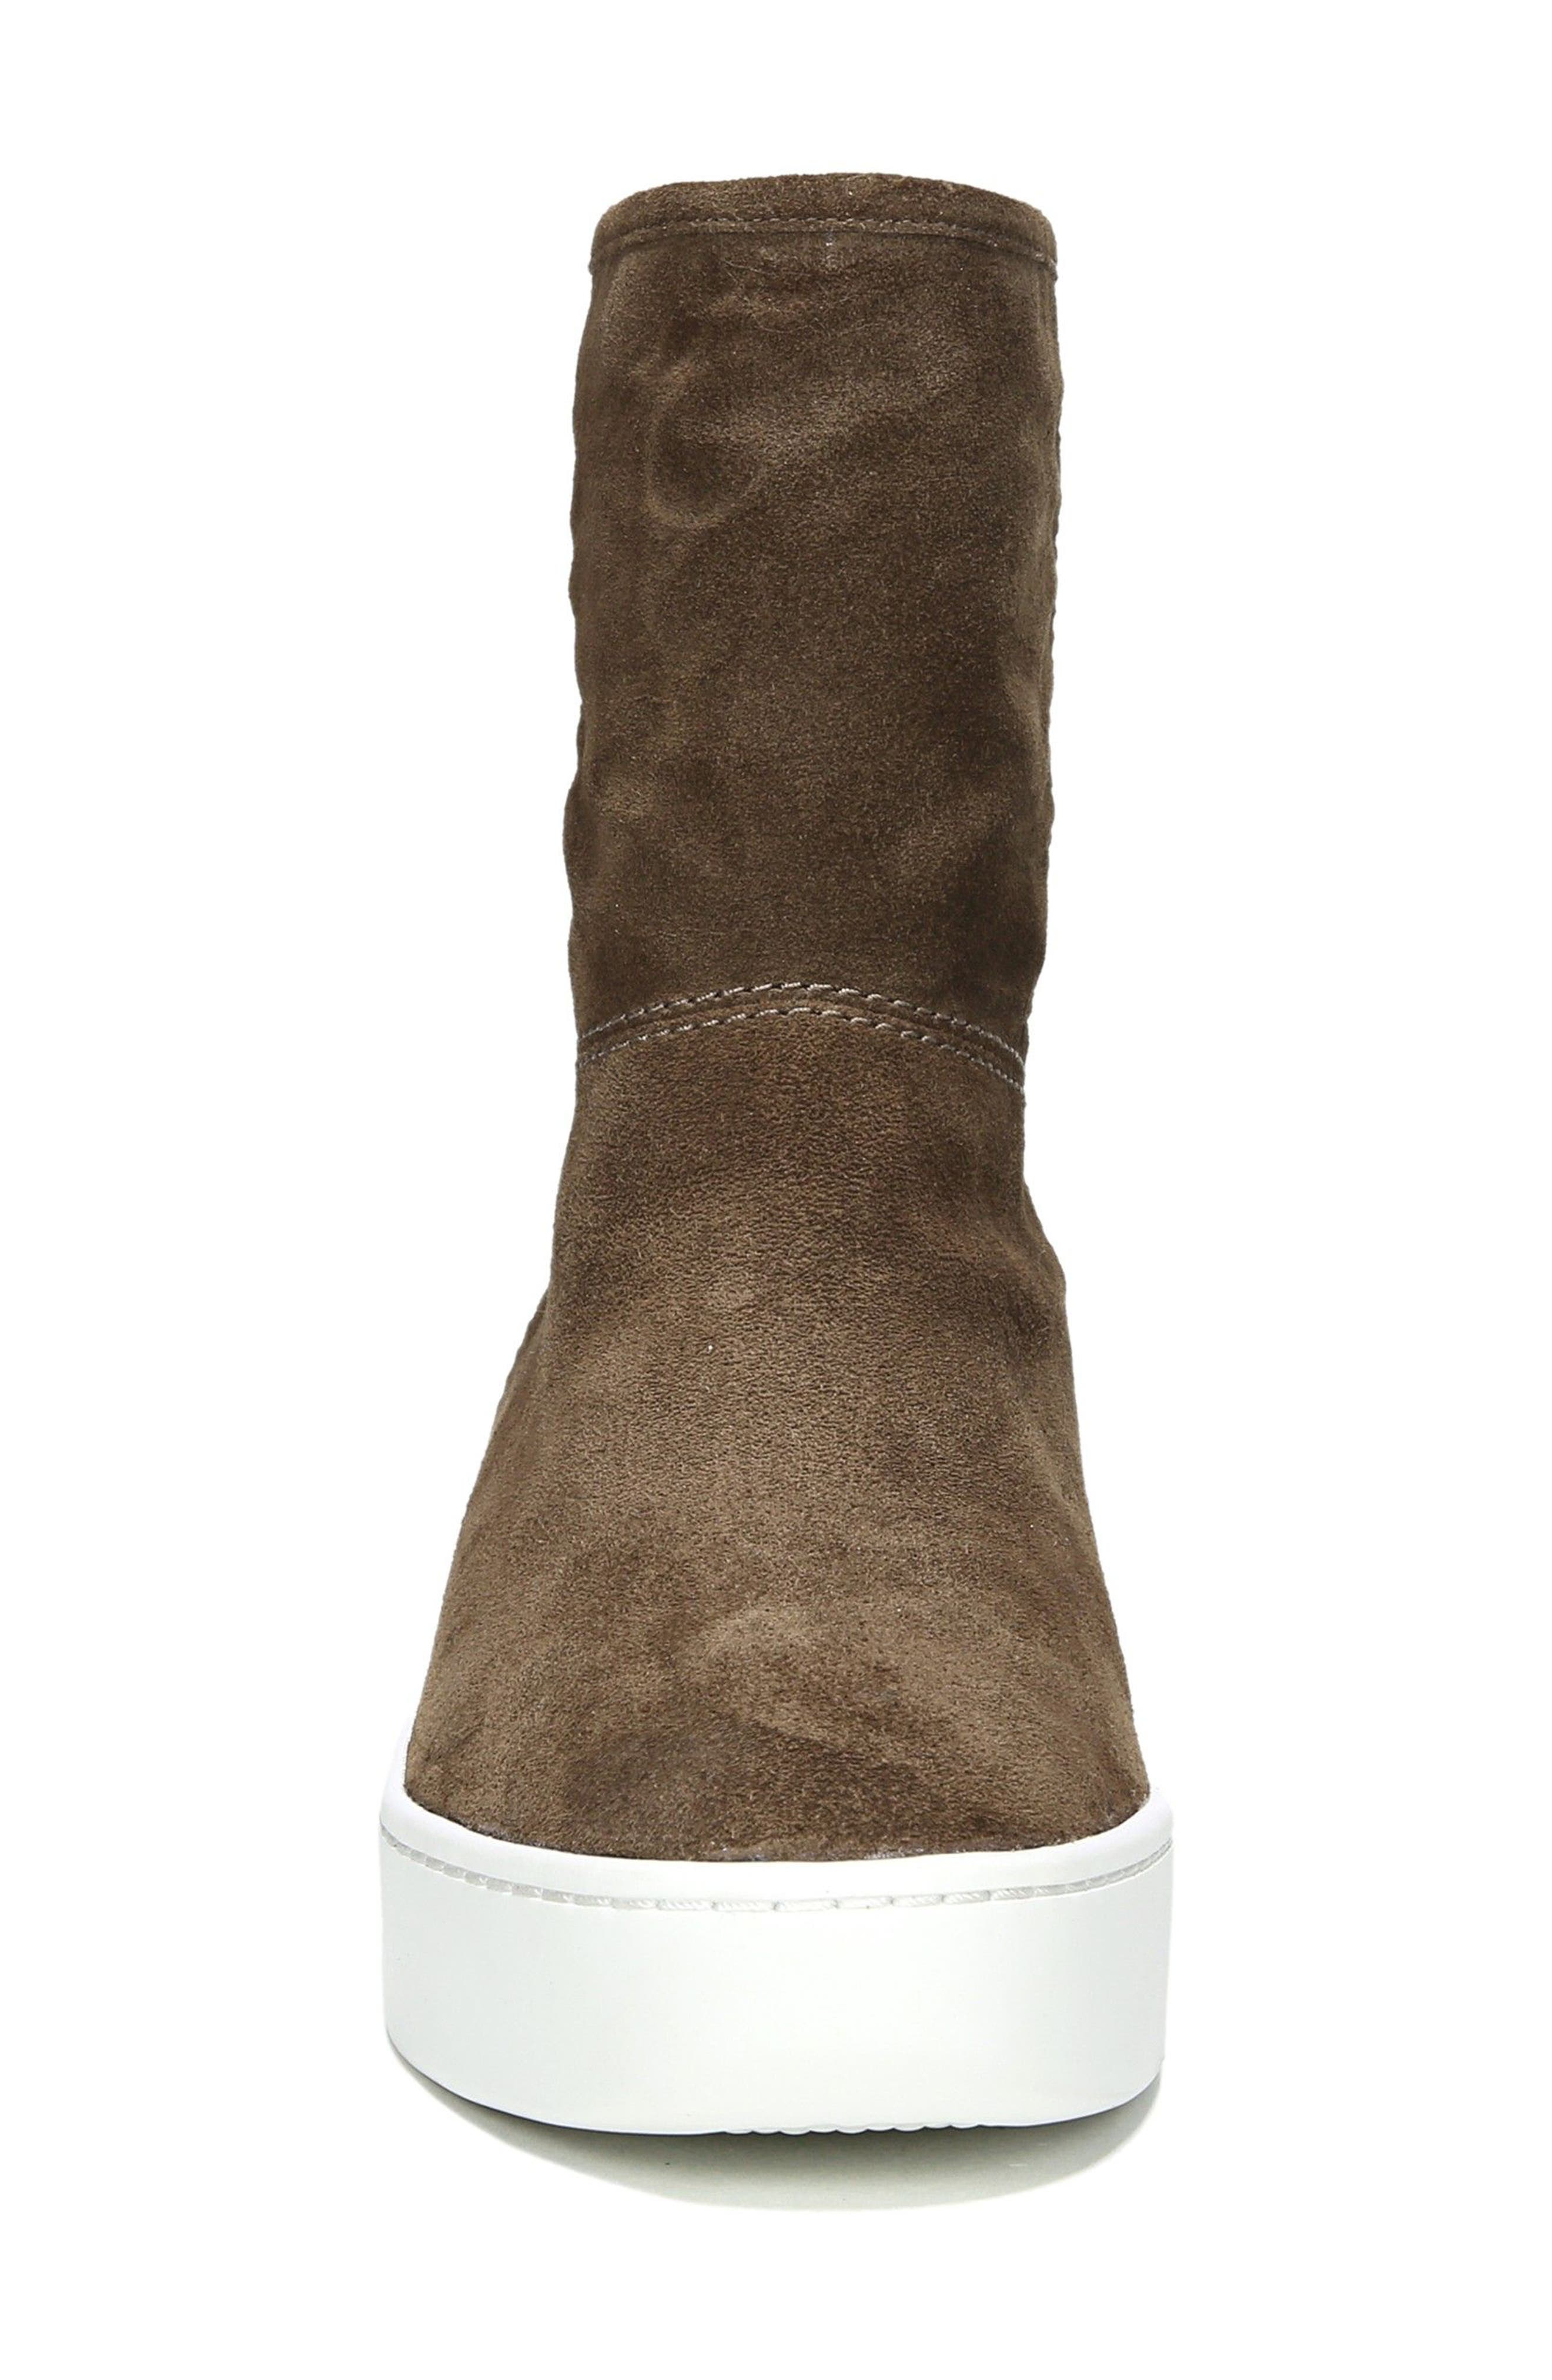 Elona Genuine Shearling Lined Sneaker Boot,                             Alternate thumbnail 4, color,                             Bark Suede